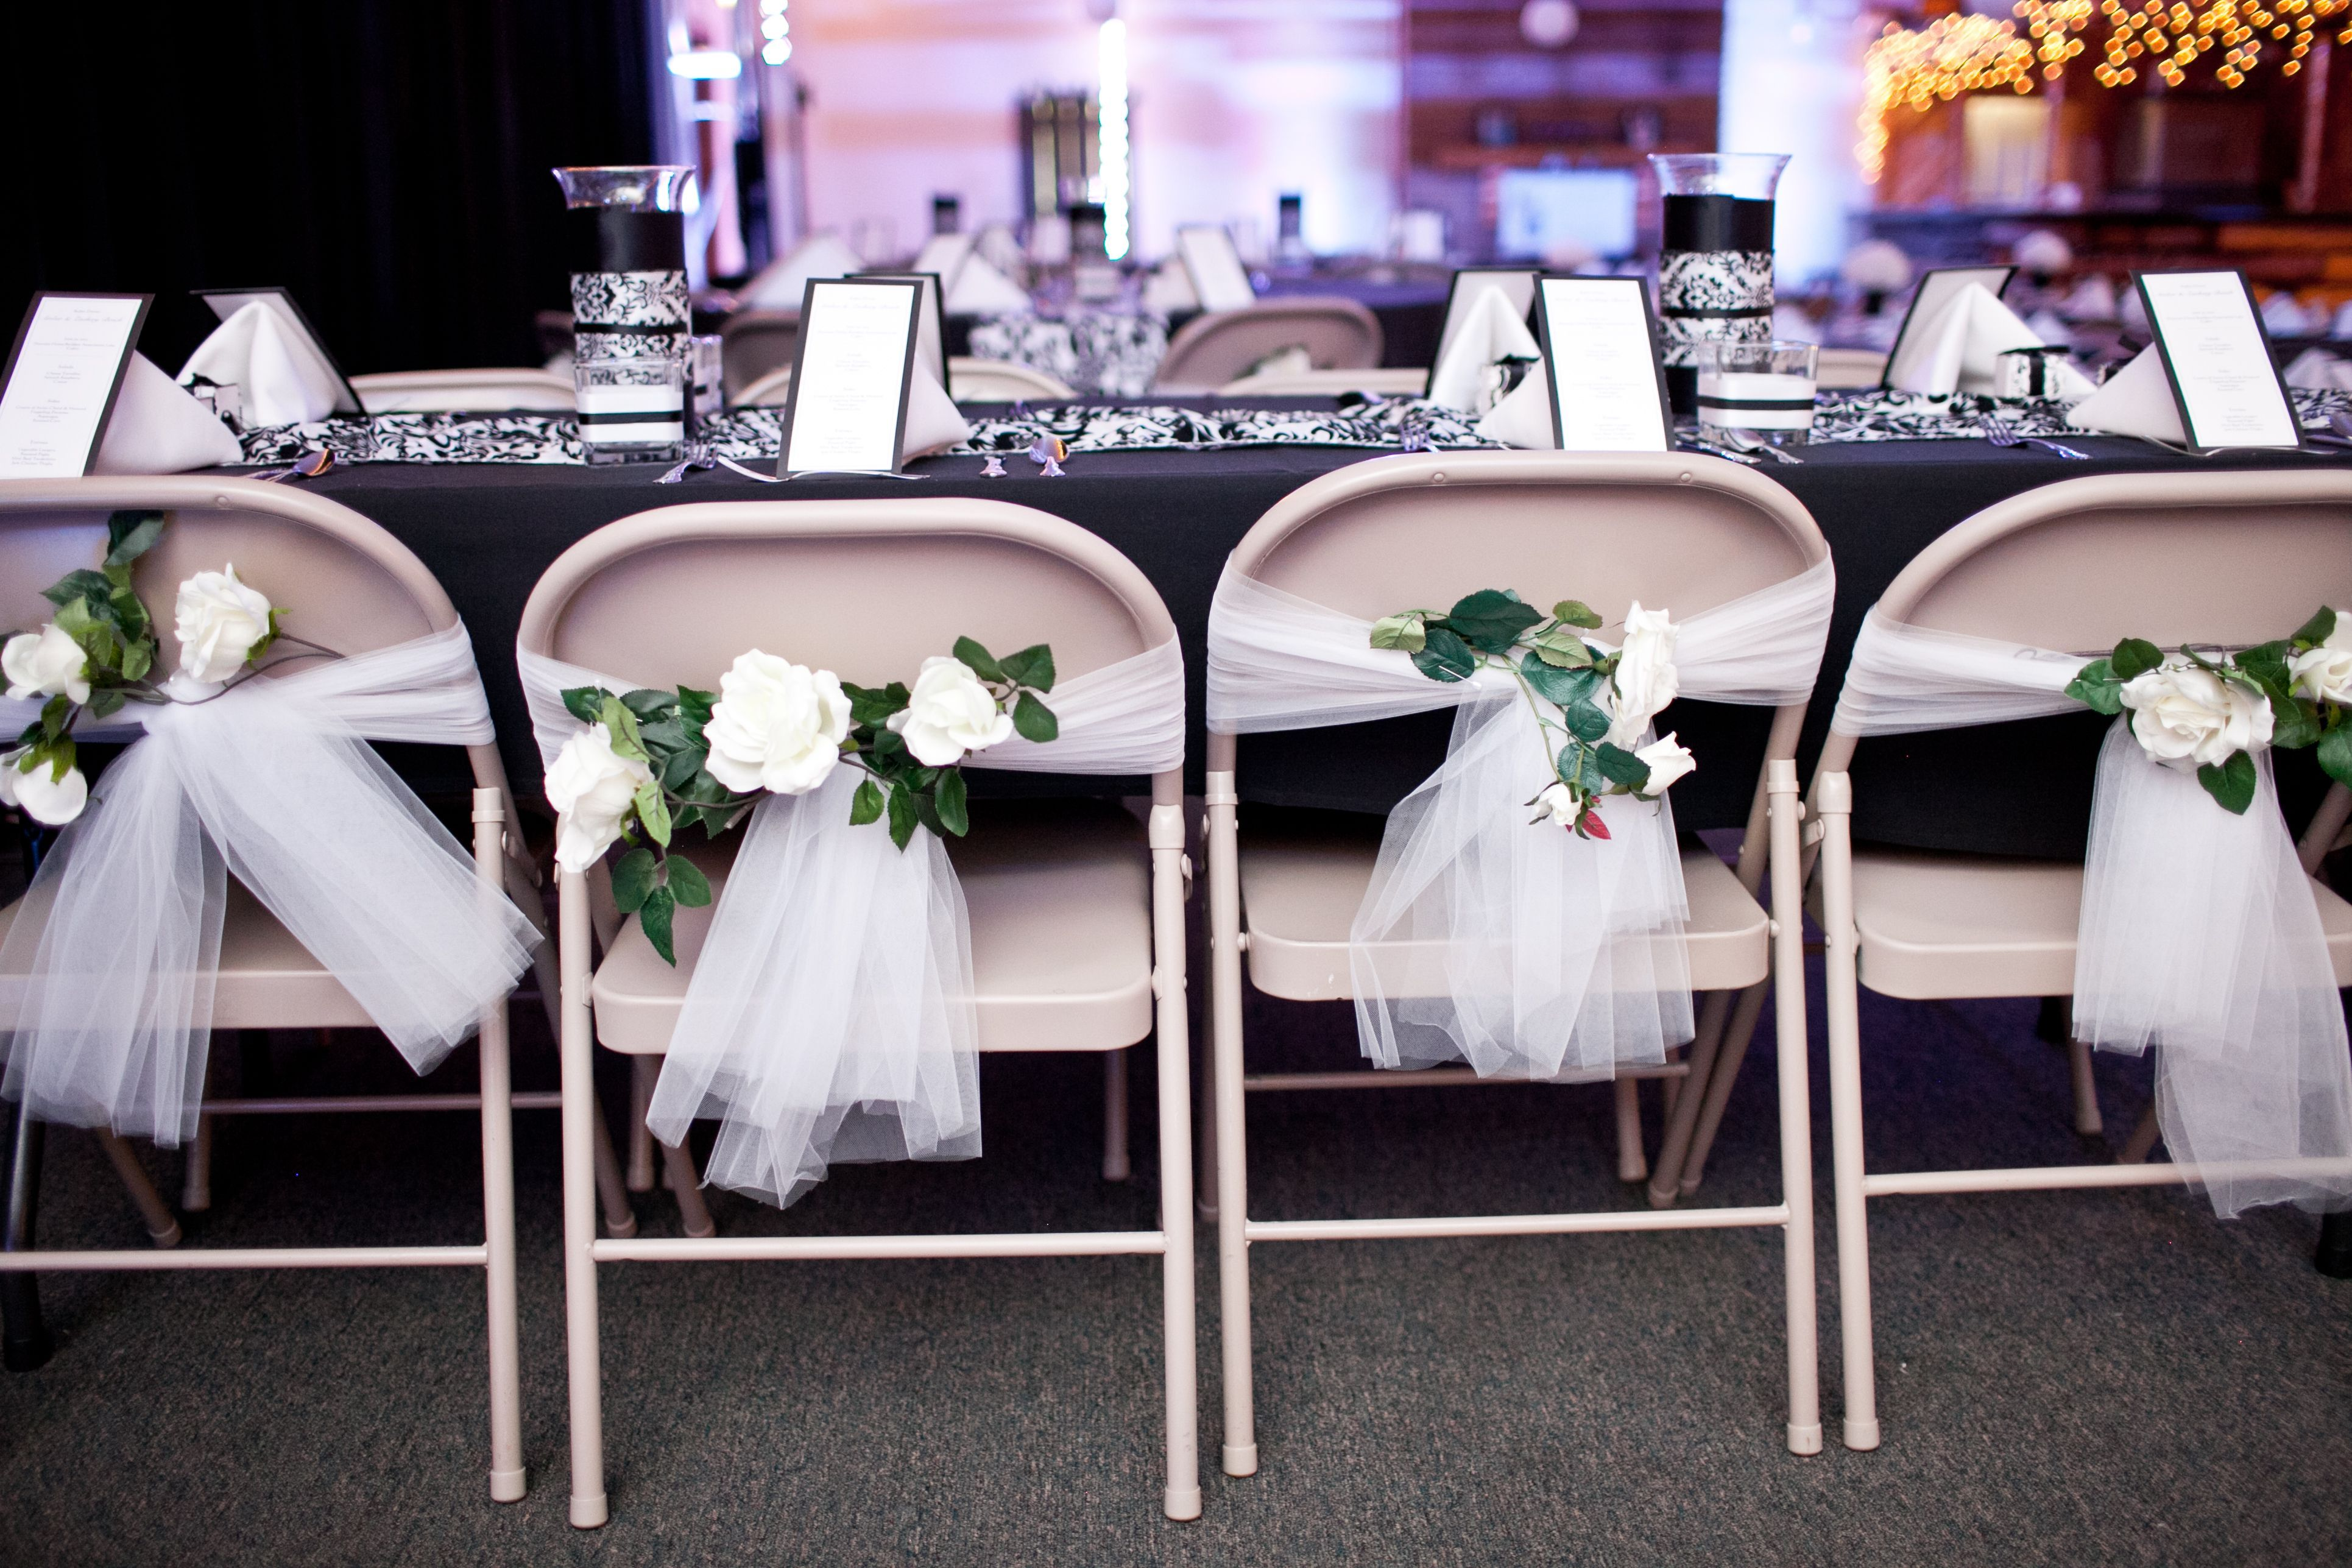 DoItYourself Wedding Chair Decorations Make a Quick